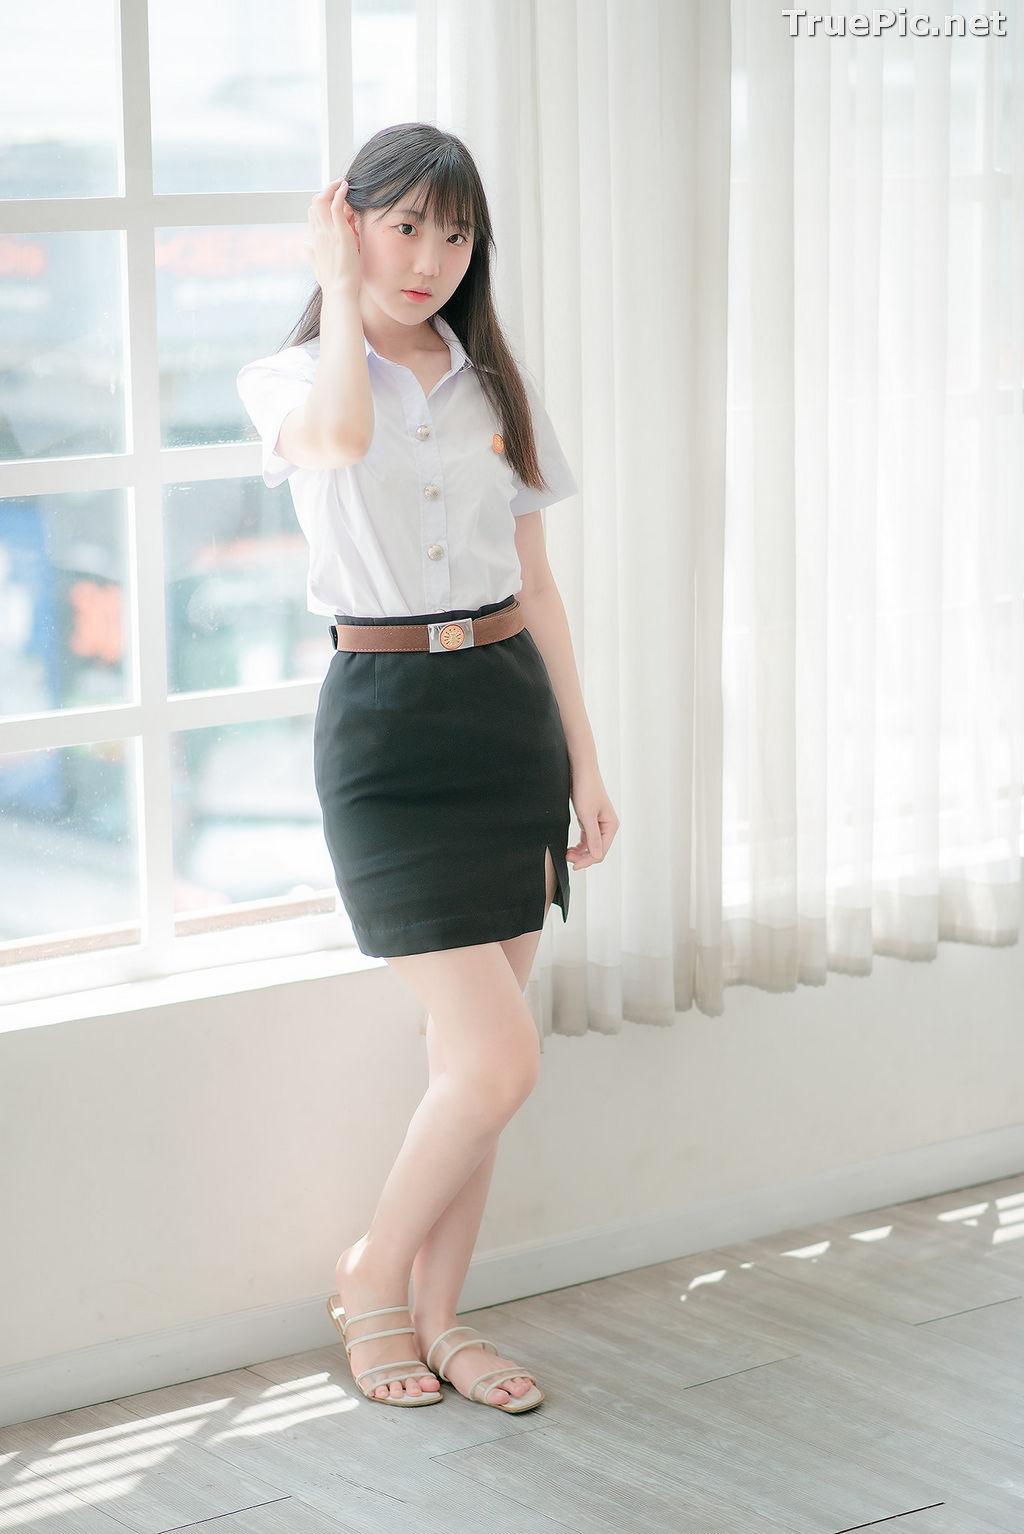 Image Thailand Model - Miki Ariyathanakit - Cute Student Girl - TruePic.net - Picture-9